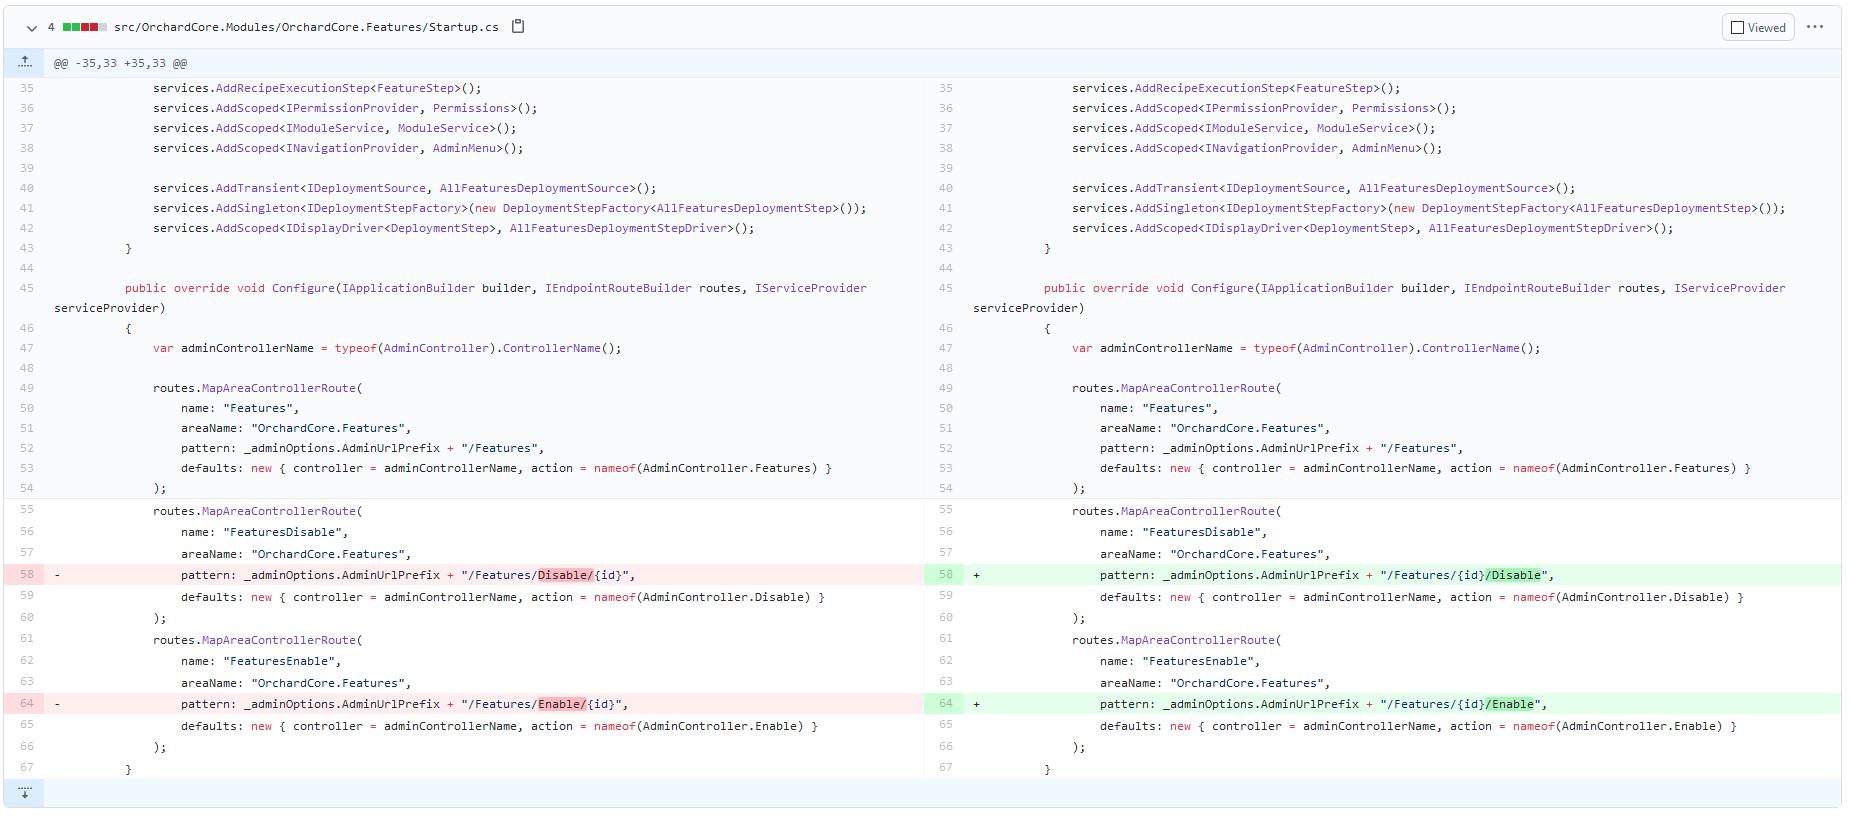 Fixing IIS URL blocking